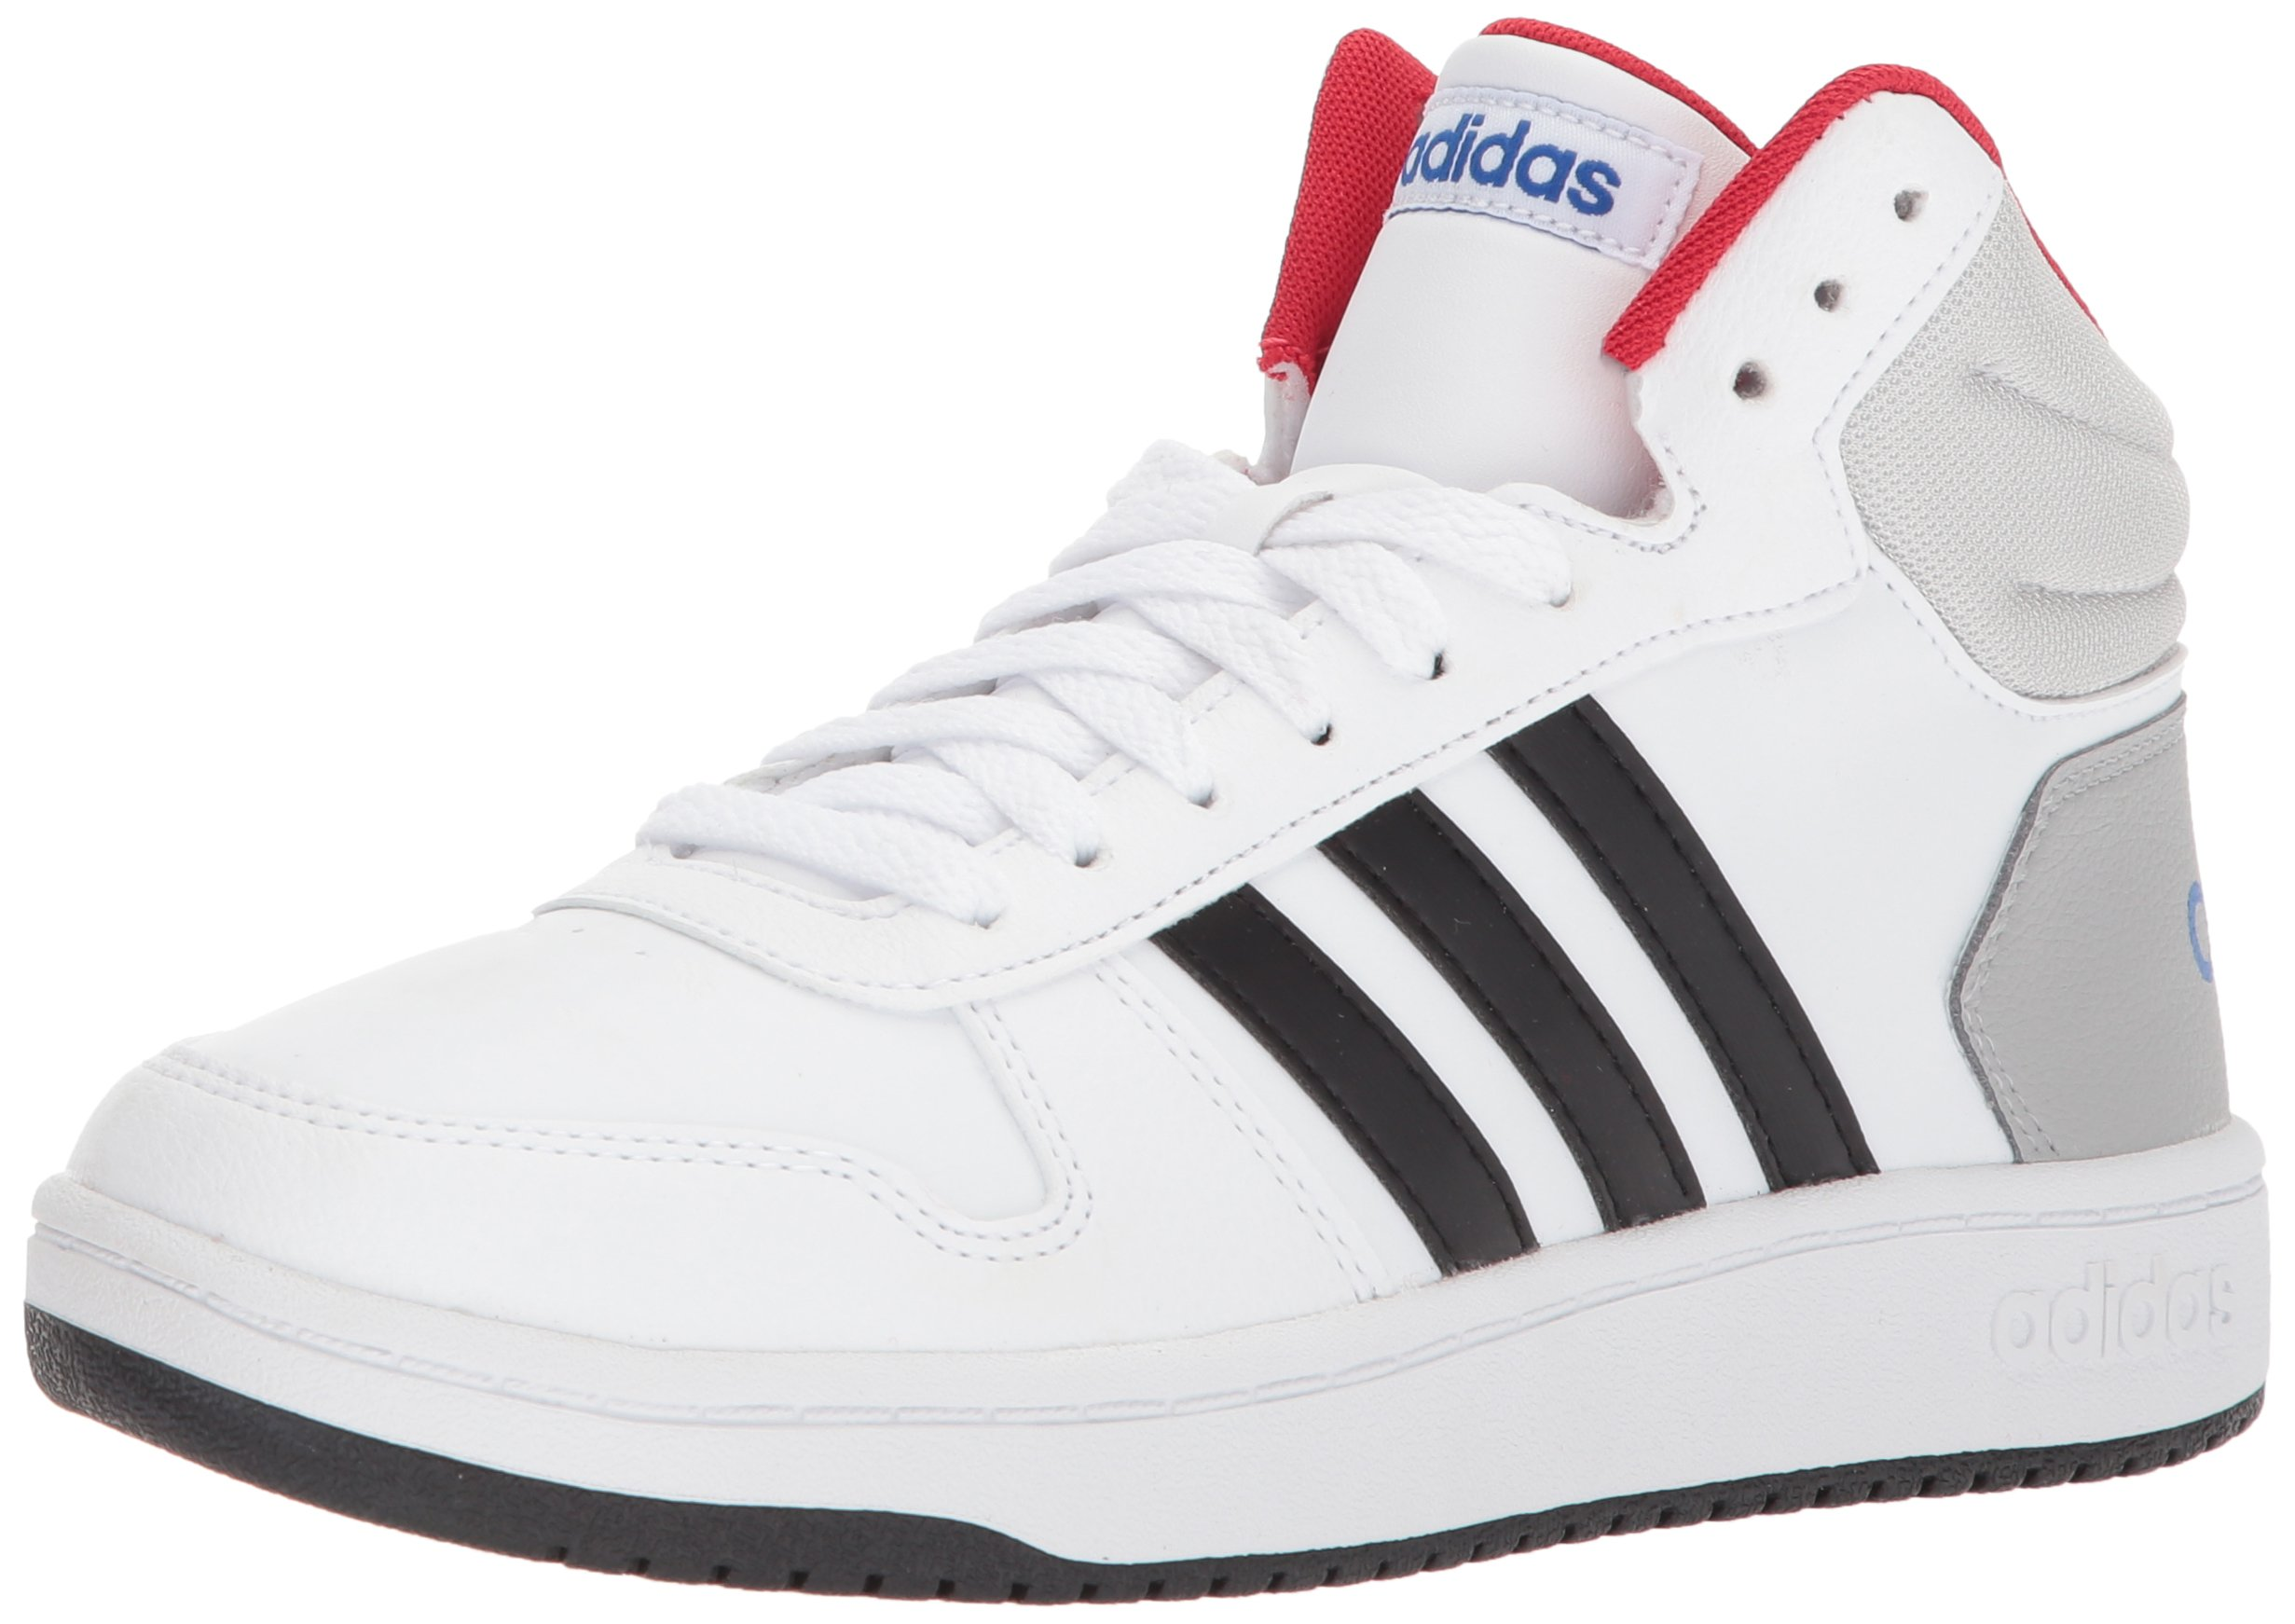 adidas Kids' Hoops Mid 2.0, White/Core Black/Scarlet, 6 M US Little Kid